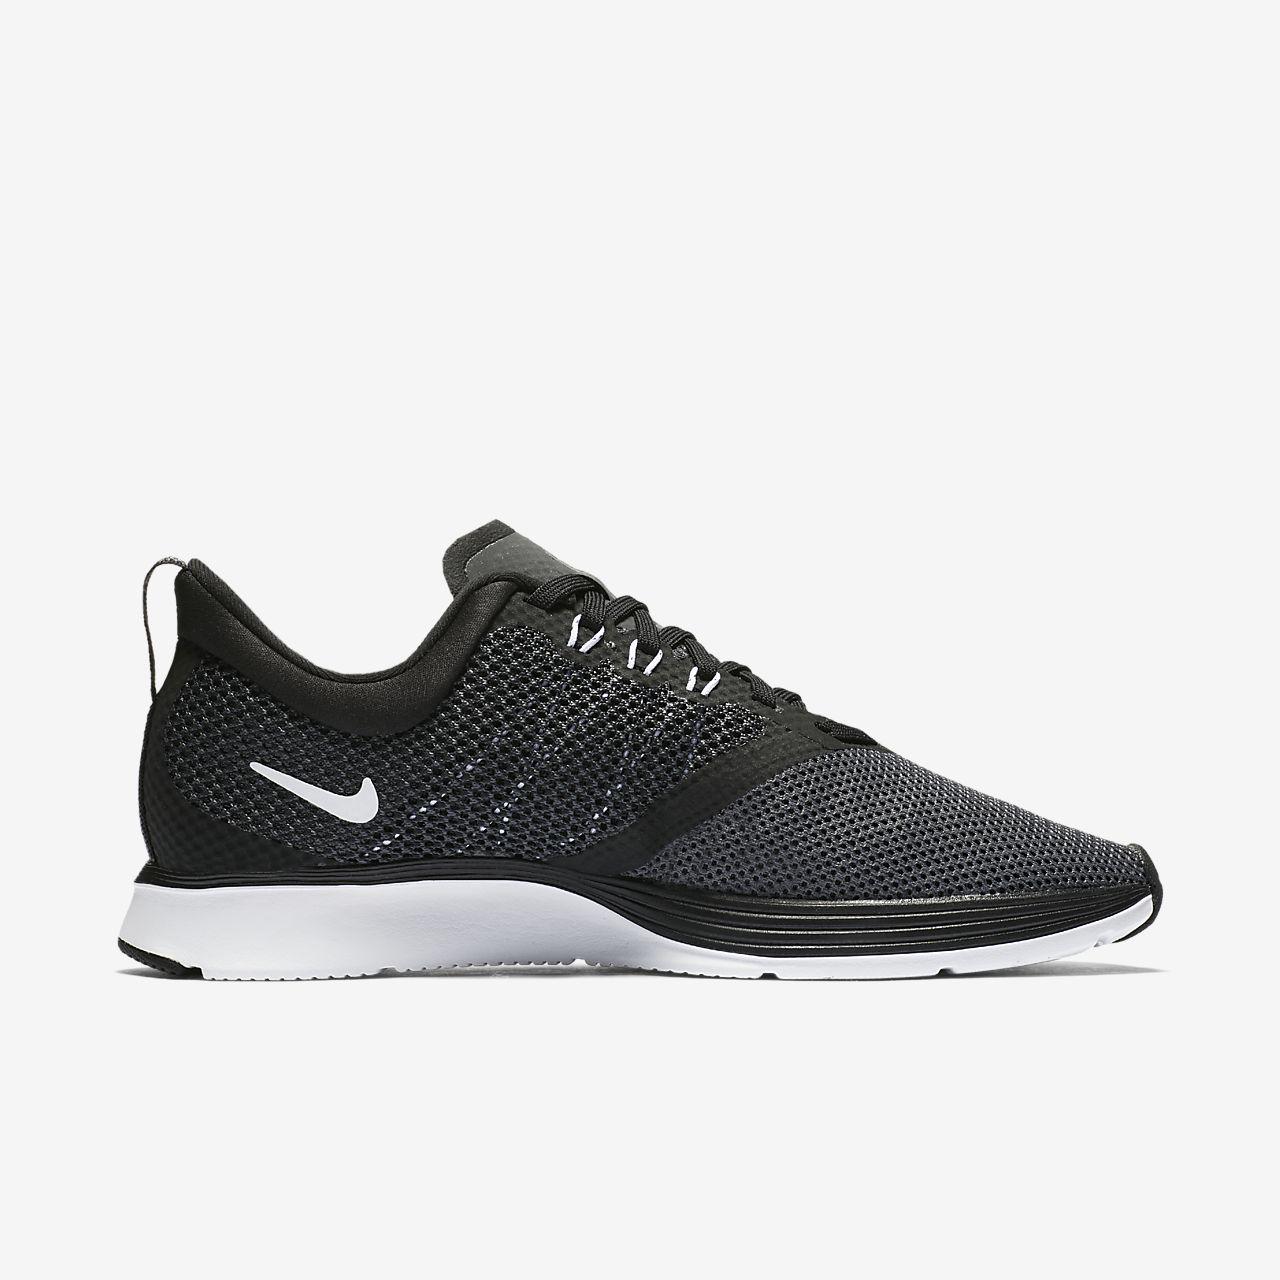 5c34b710939 Nike Zoom Strike Women s Running Shoe. Nike.com AU